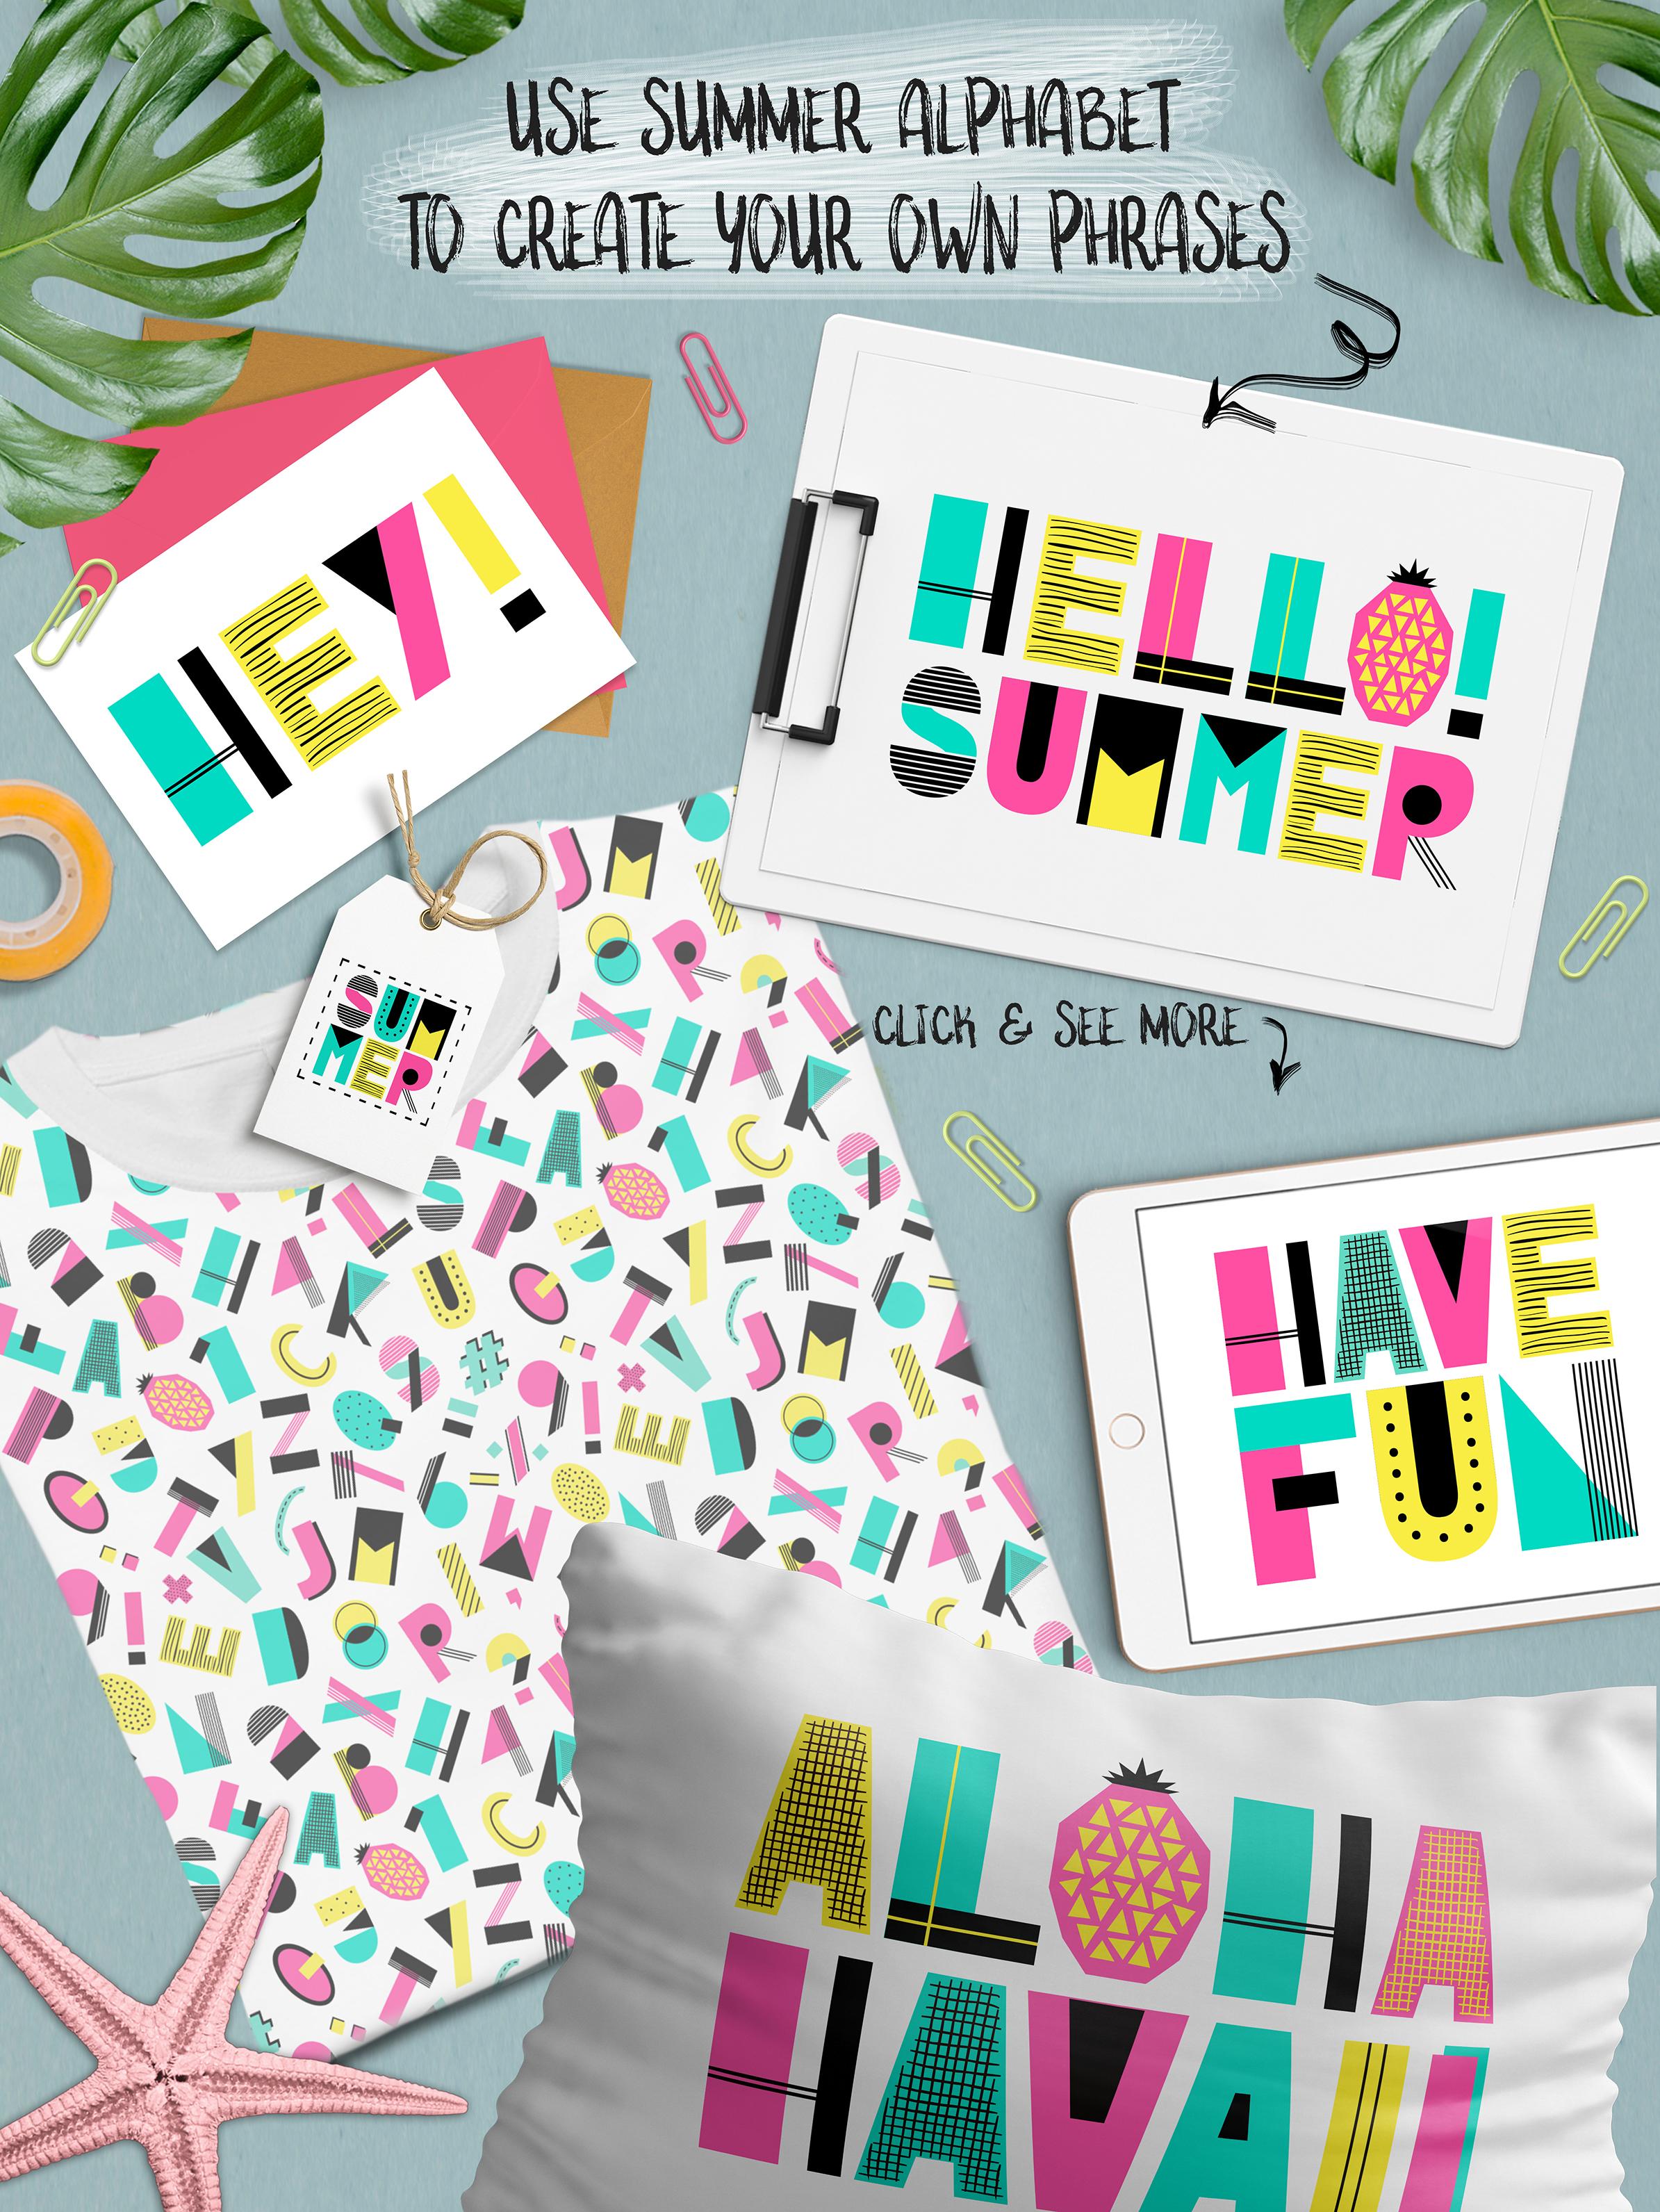 Cute Summer Alphabet example image 2